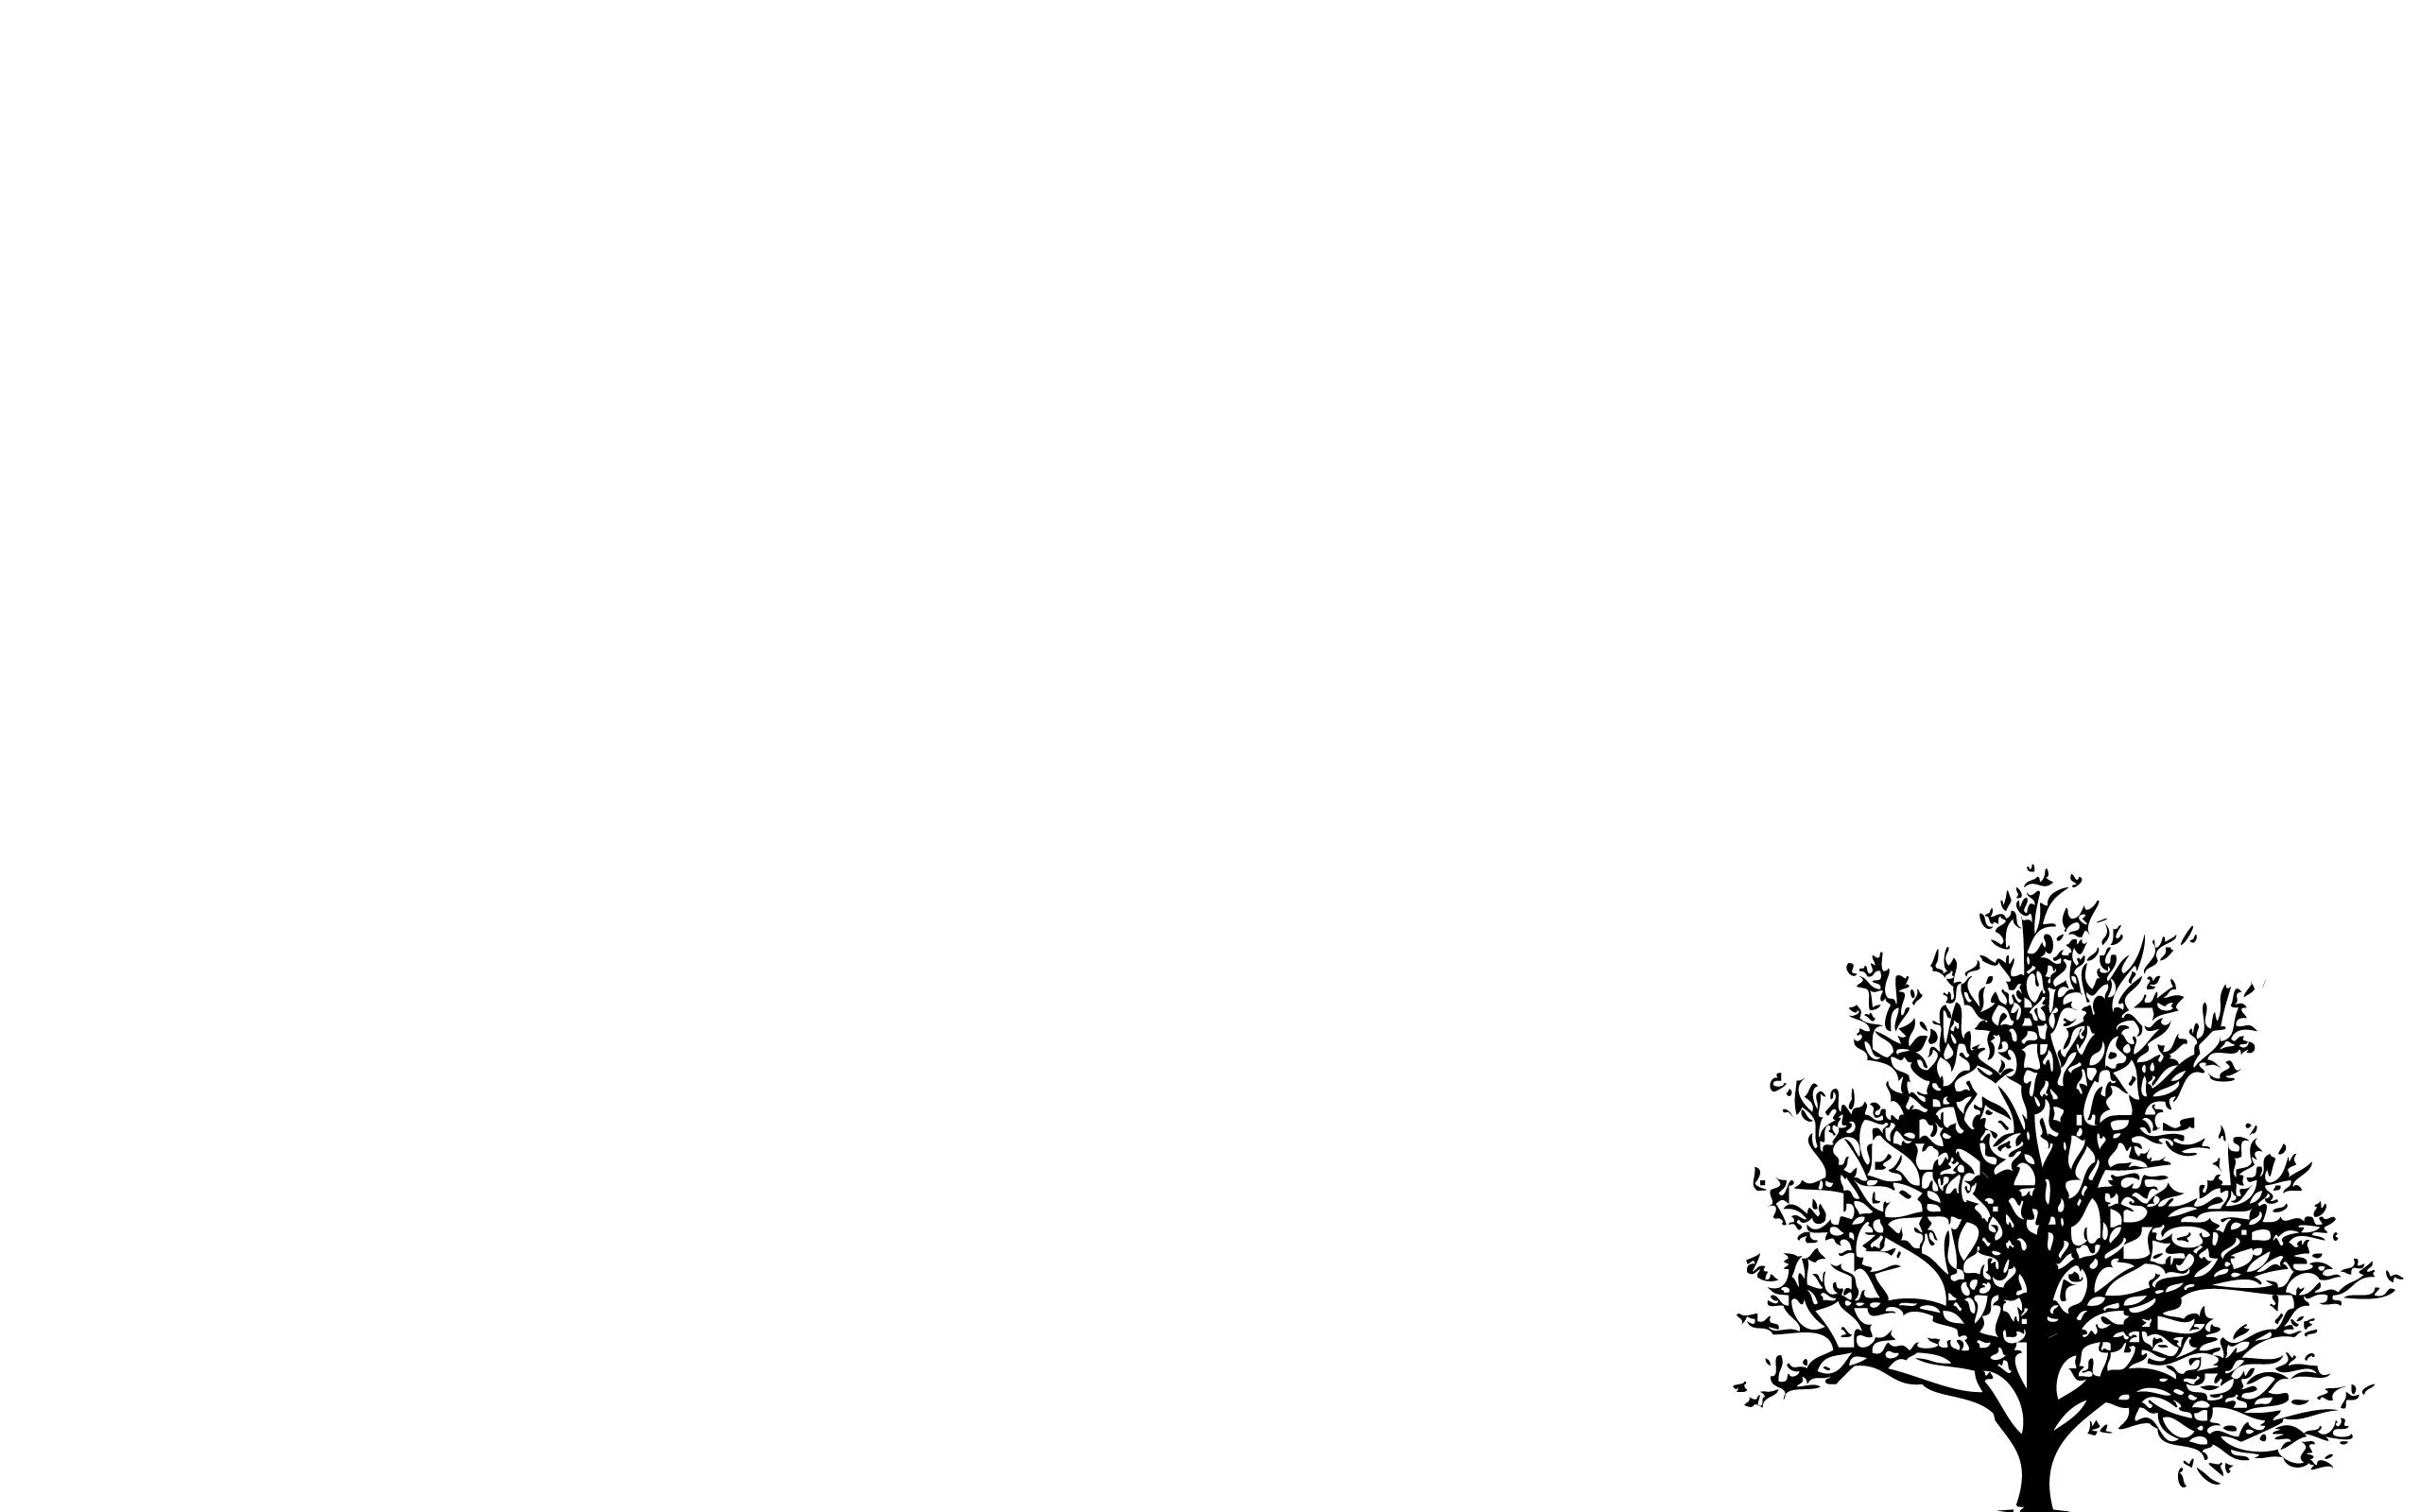 White Minimalist Desktop Wallpapers   Top White Minimalist 2560x1600